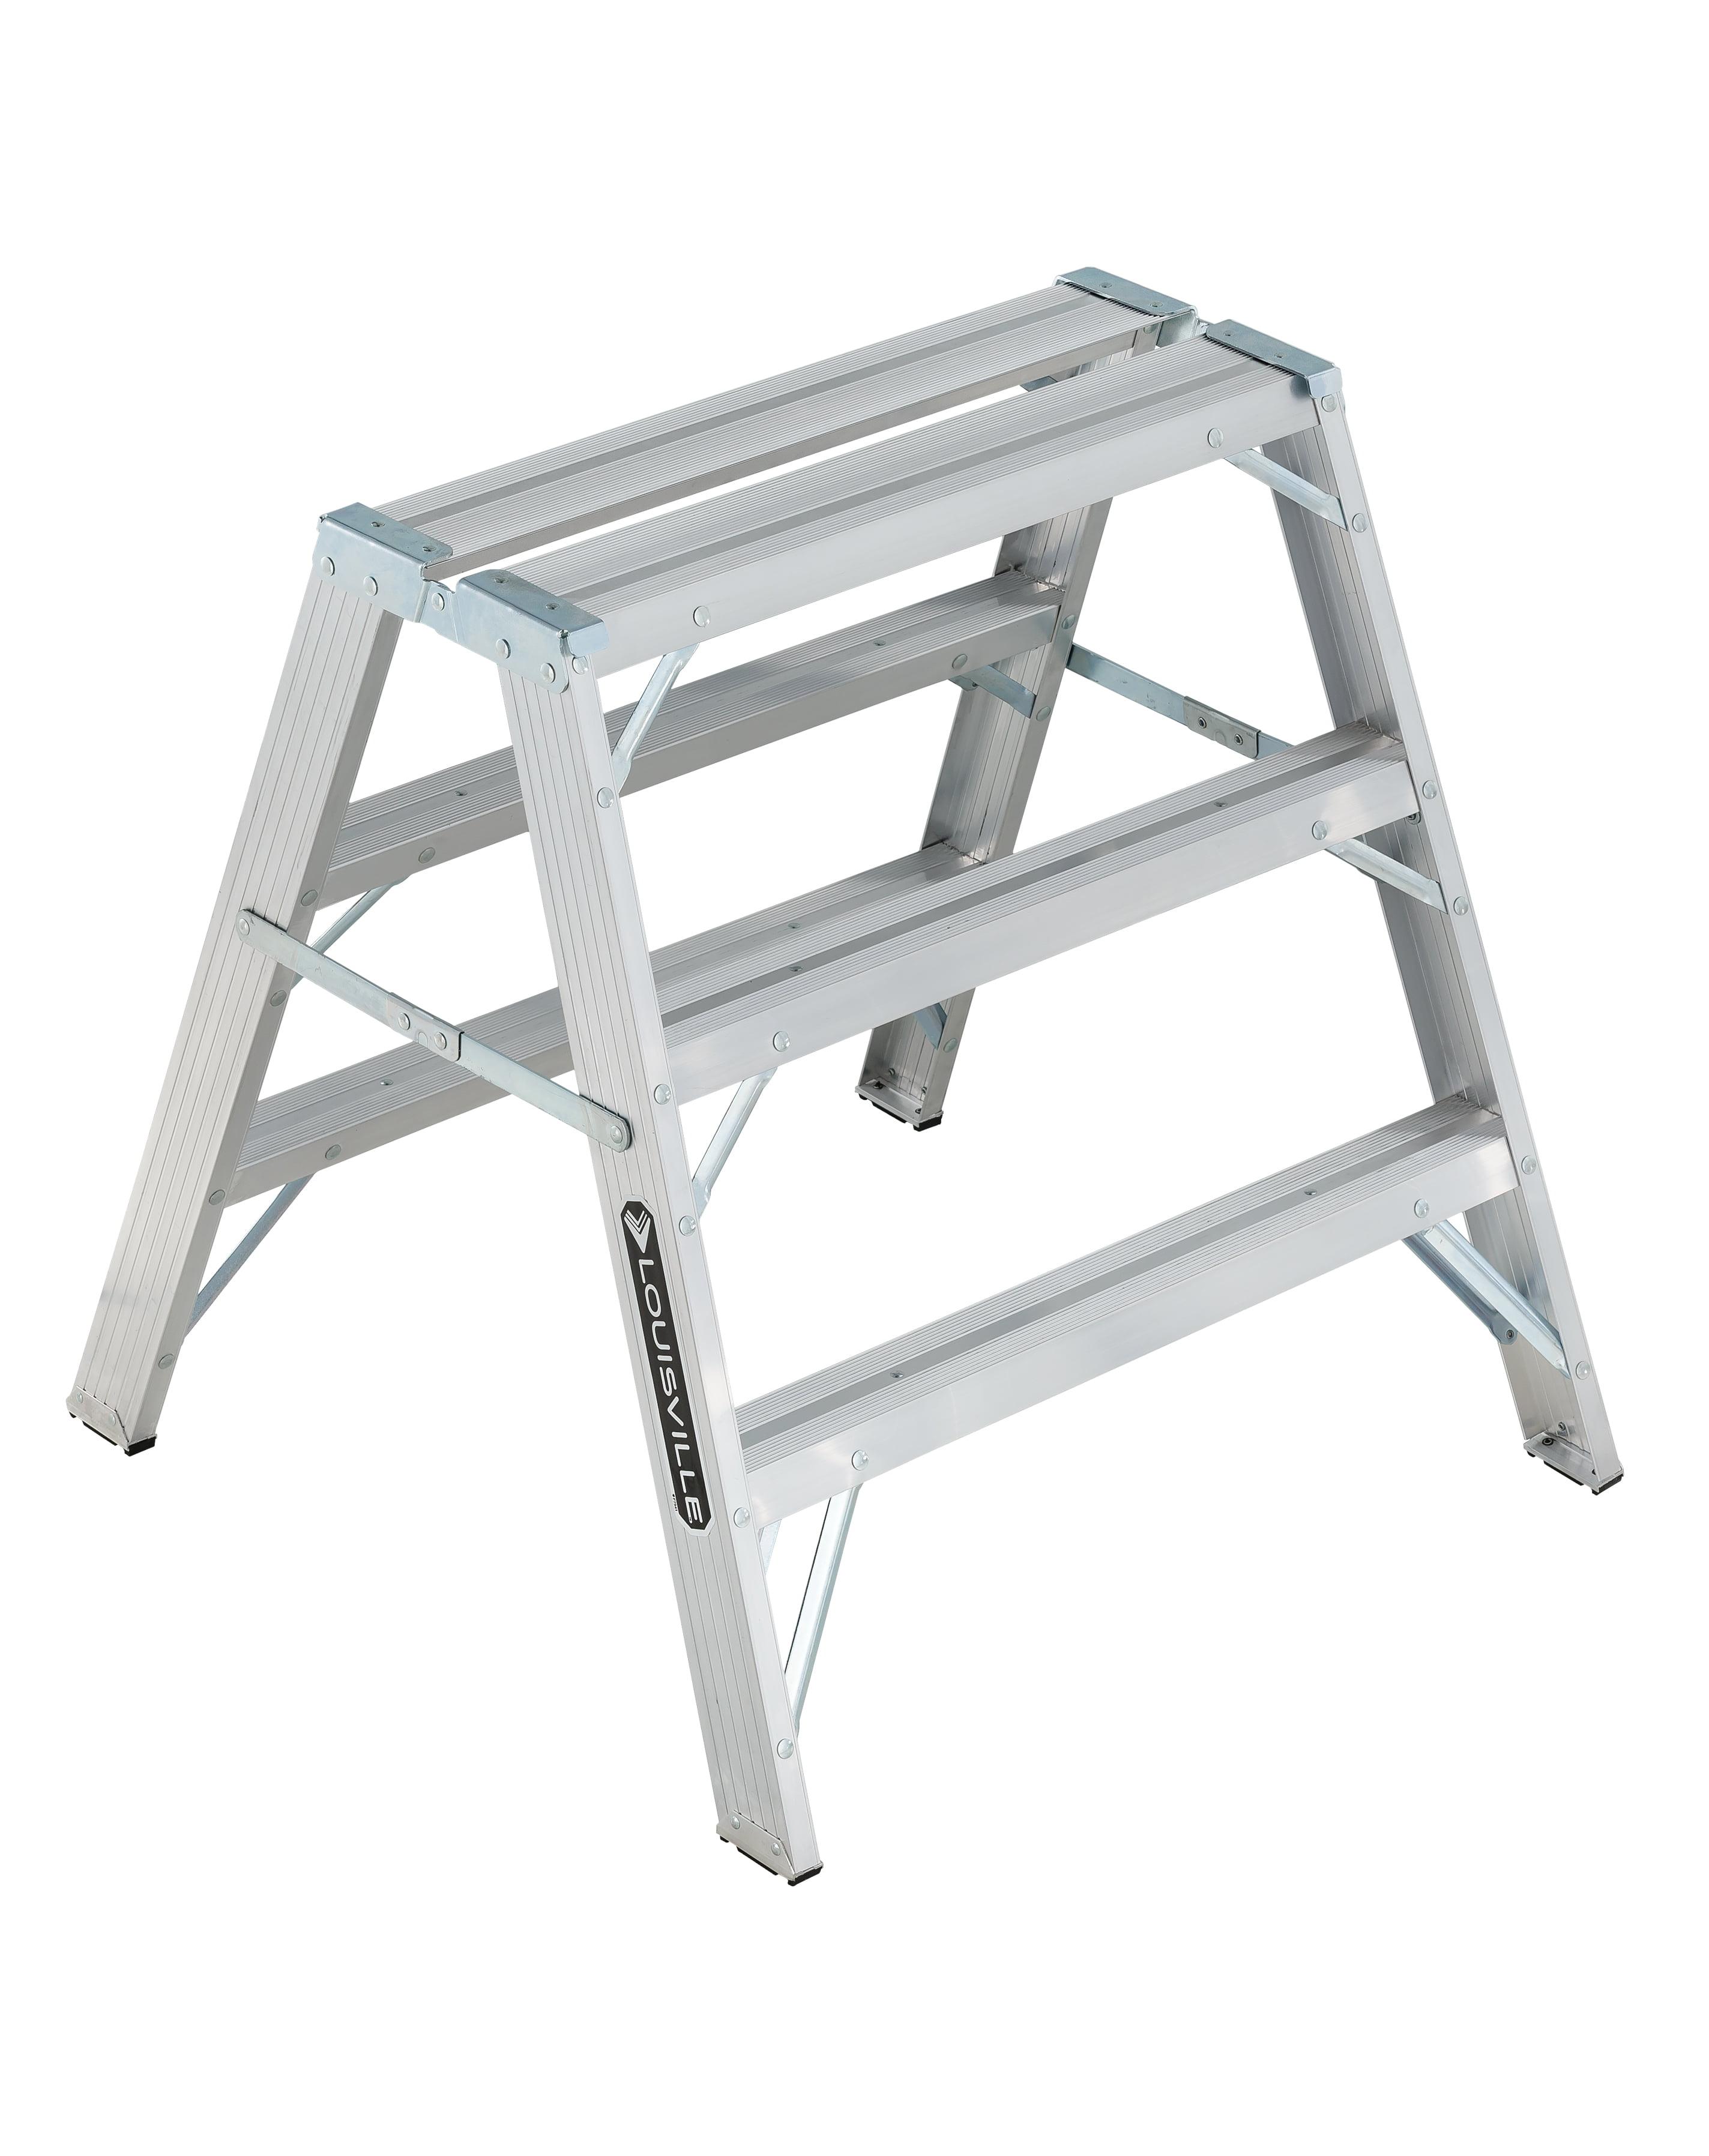 Louisville Ladder L-2032-03 3 ft. Aluminum Sawhorse Ladder, Type IA, 300 lbs. Load... by Louisville Ladder